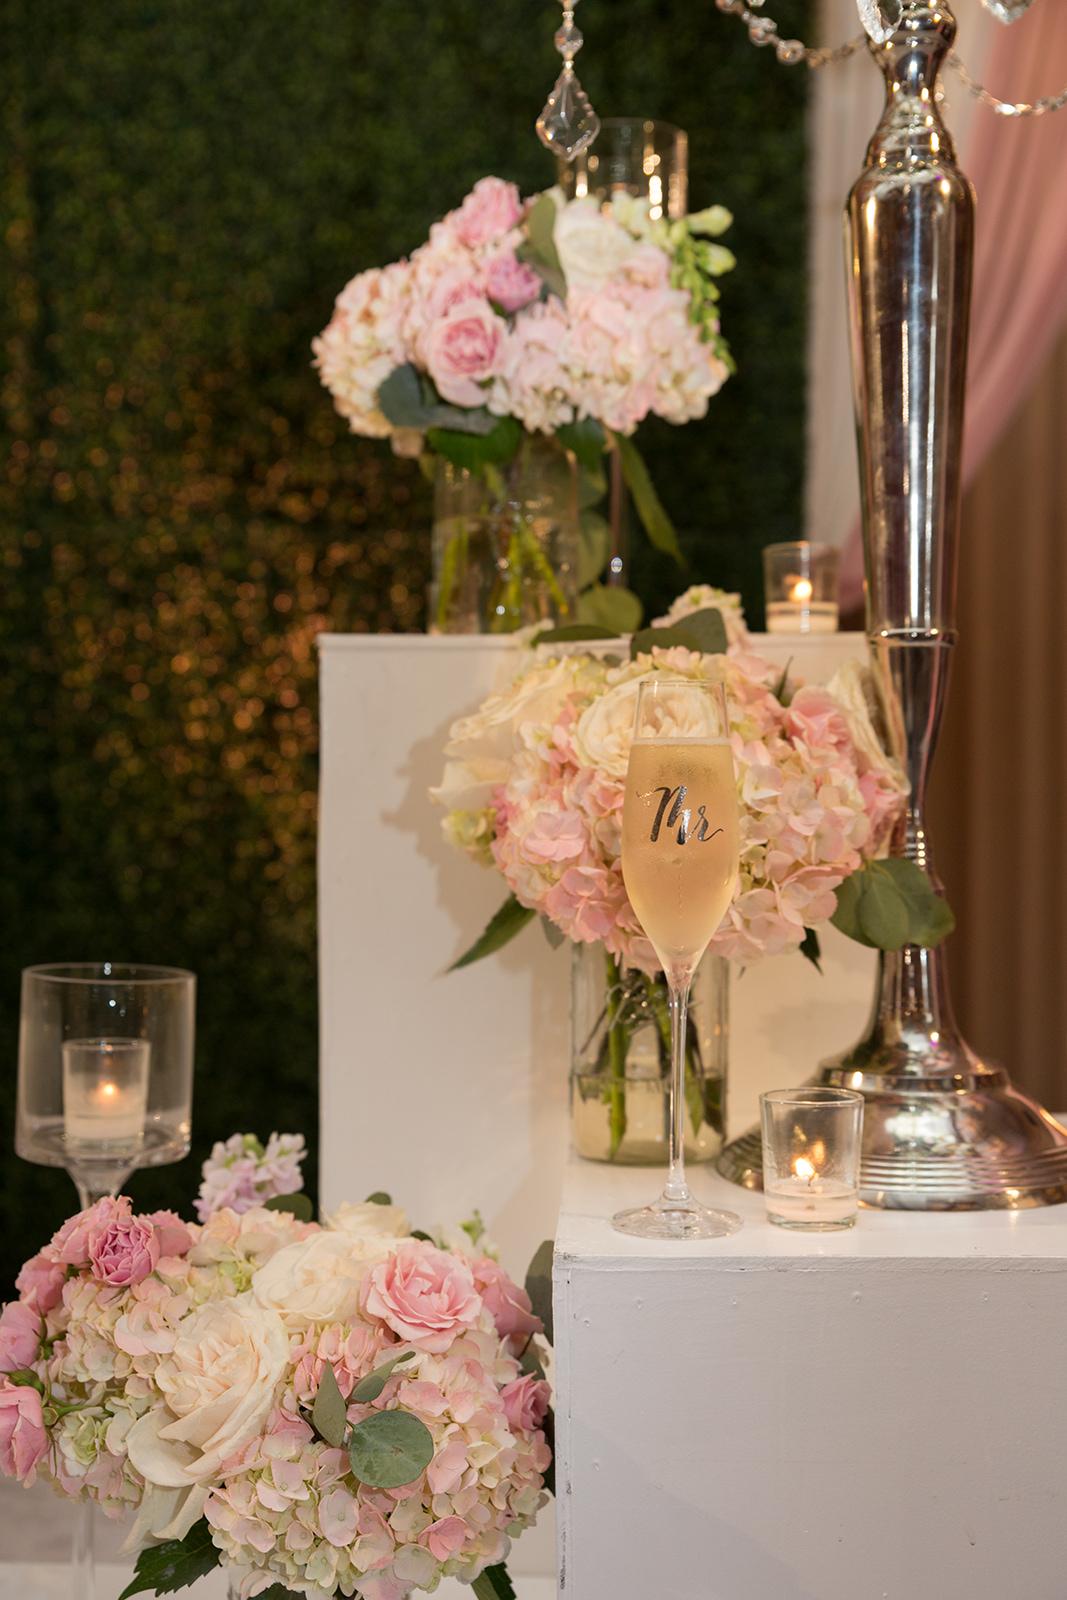 Le Cape Weddings - Sumeet and Chavi - Reception Details  -47.jpg